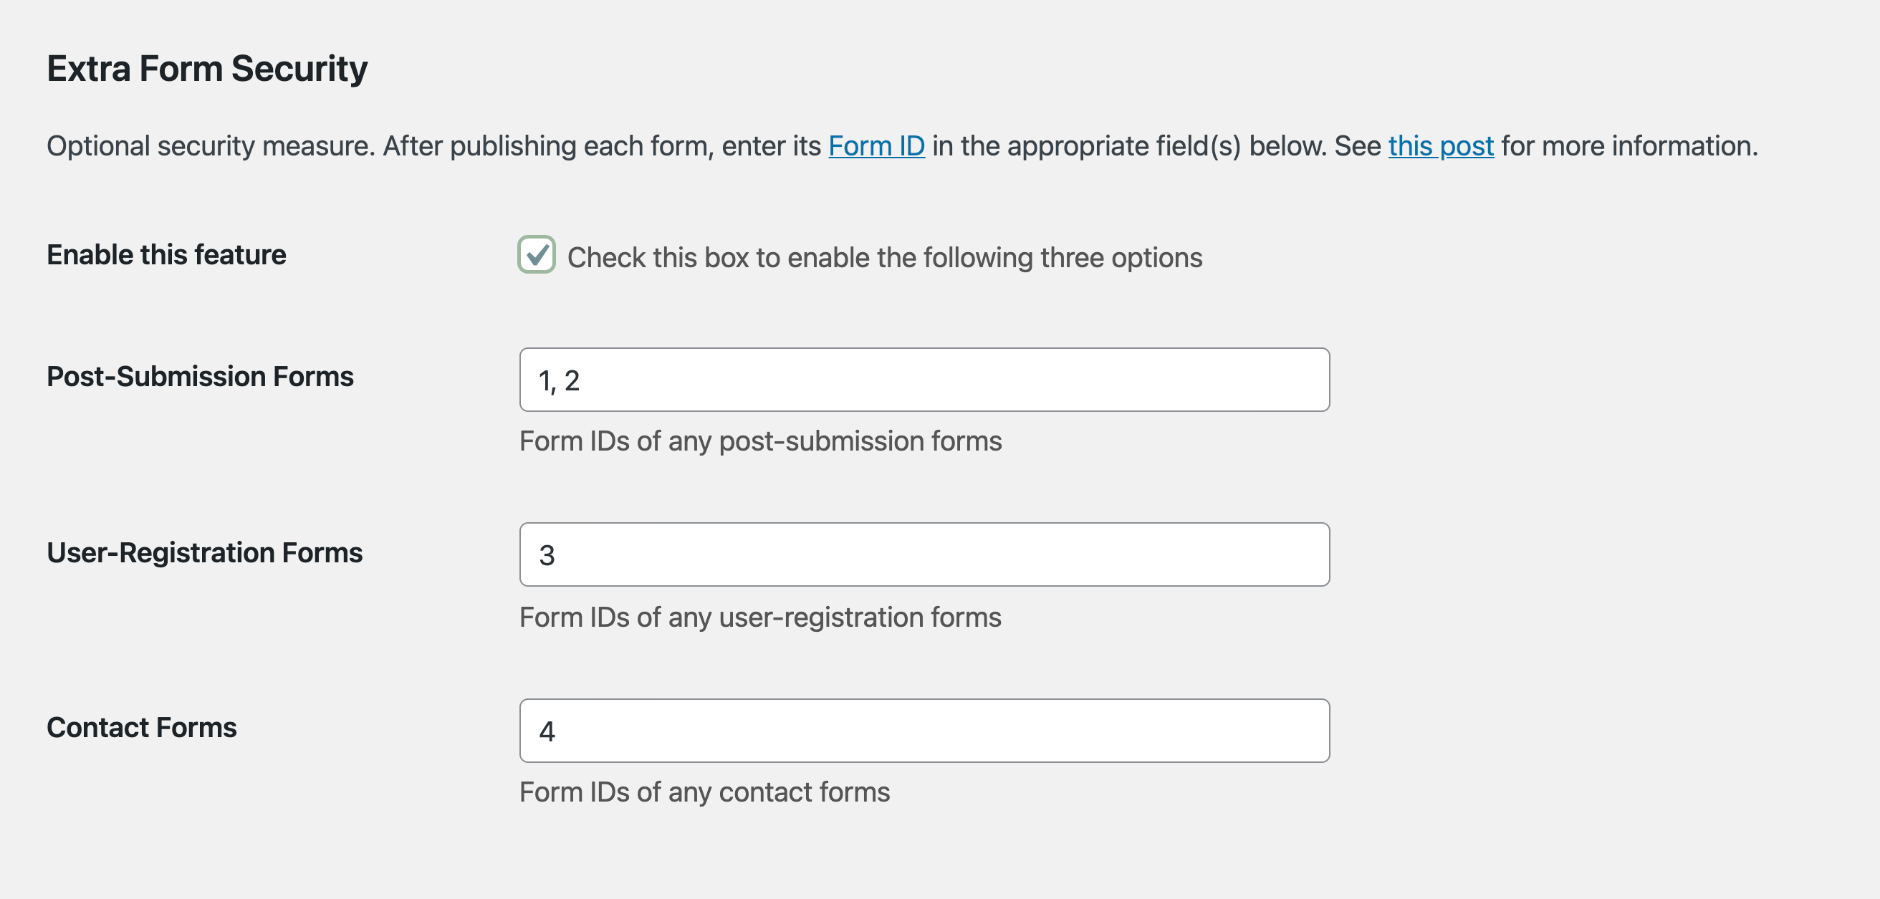 USP Pro - Extra Form Security Numeric IDs